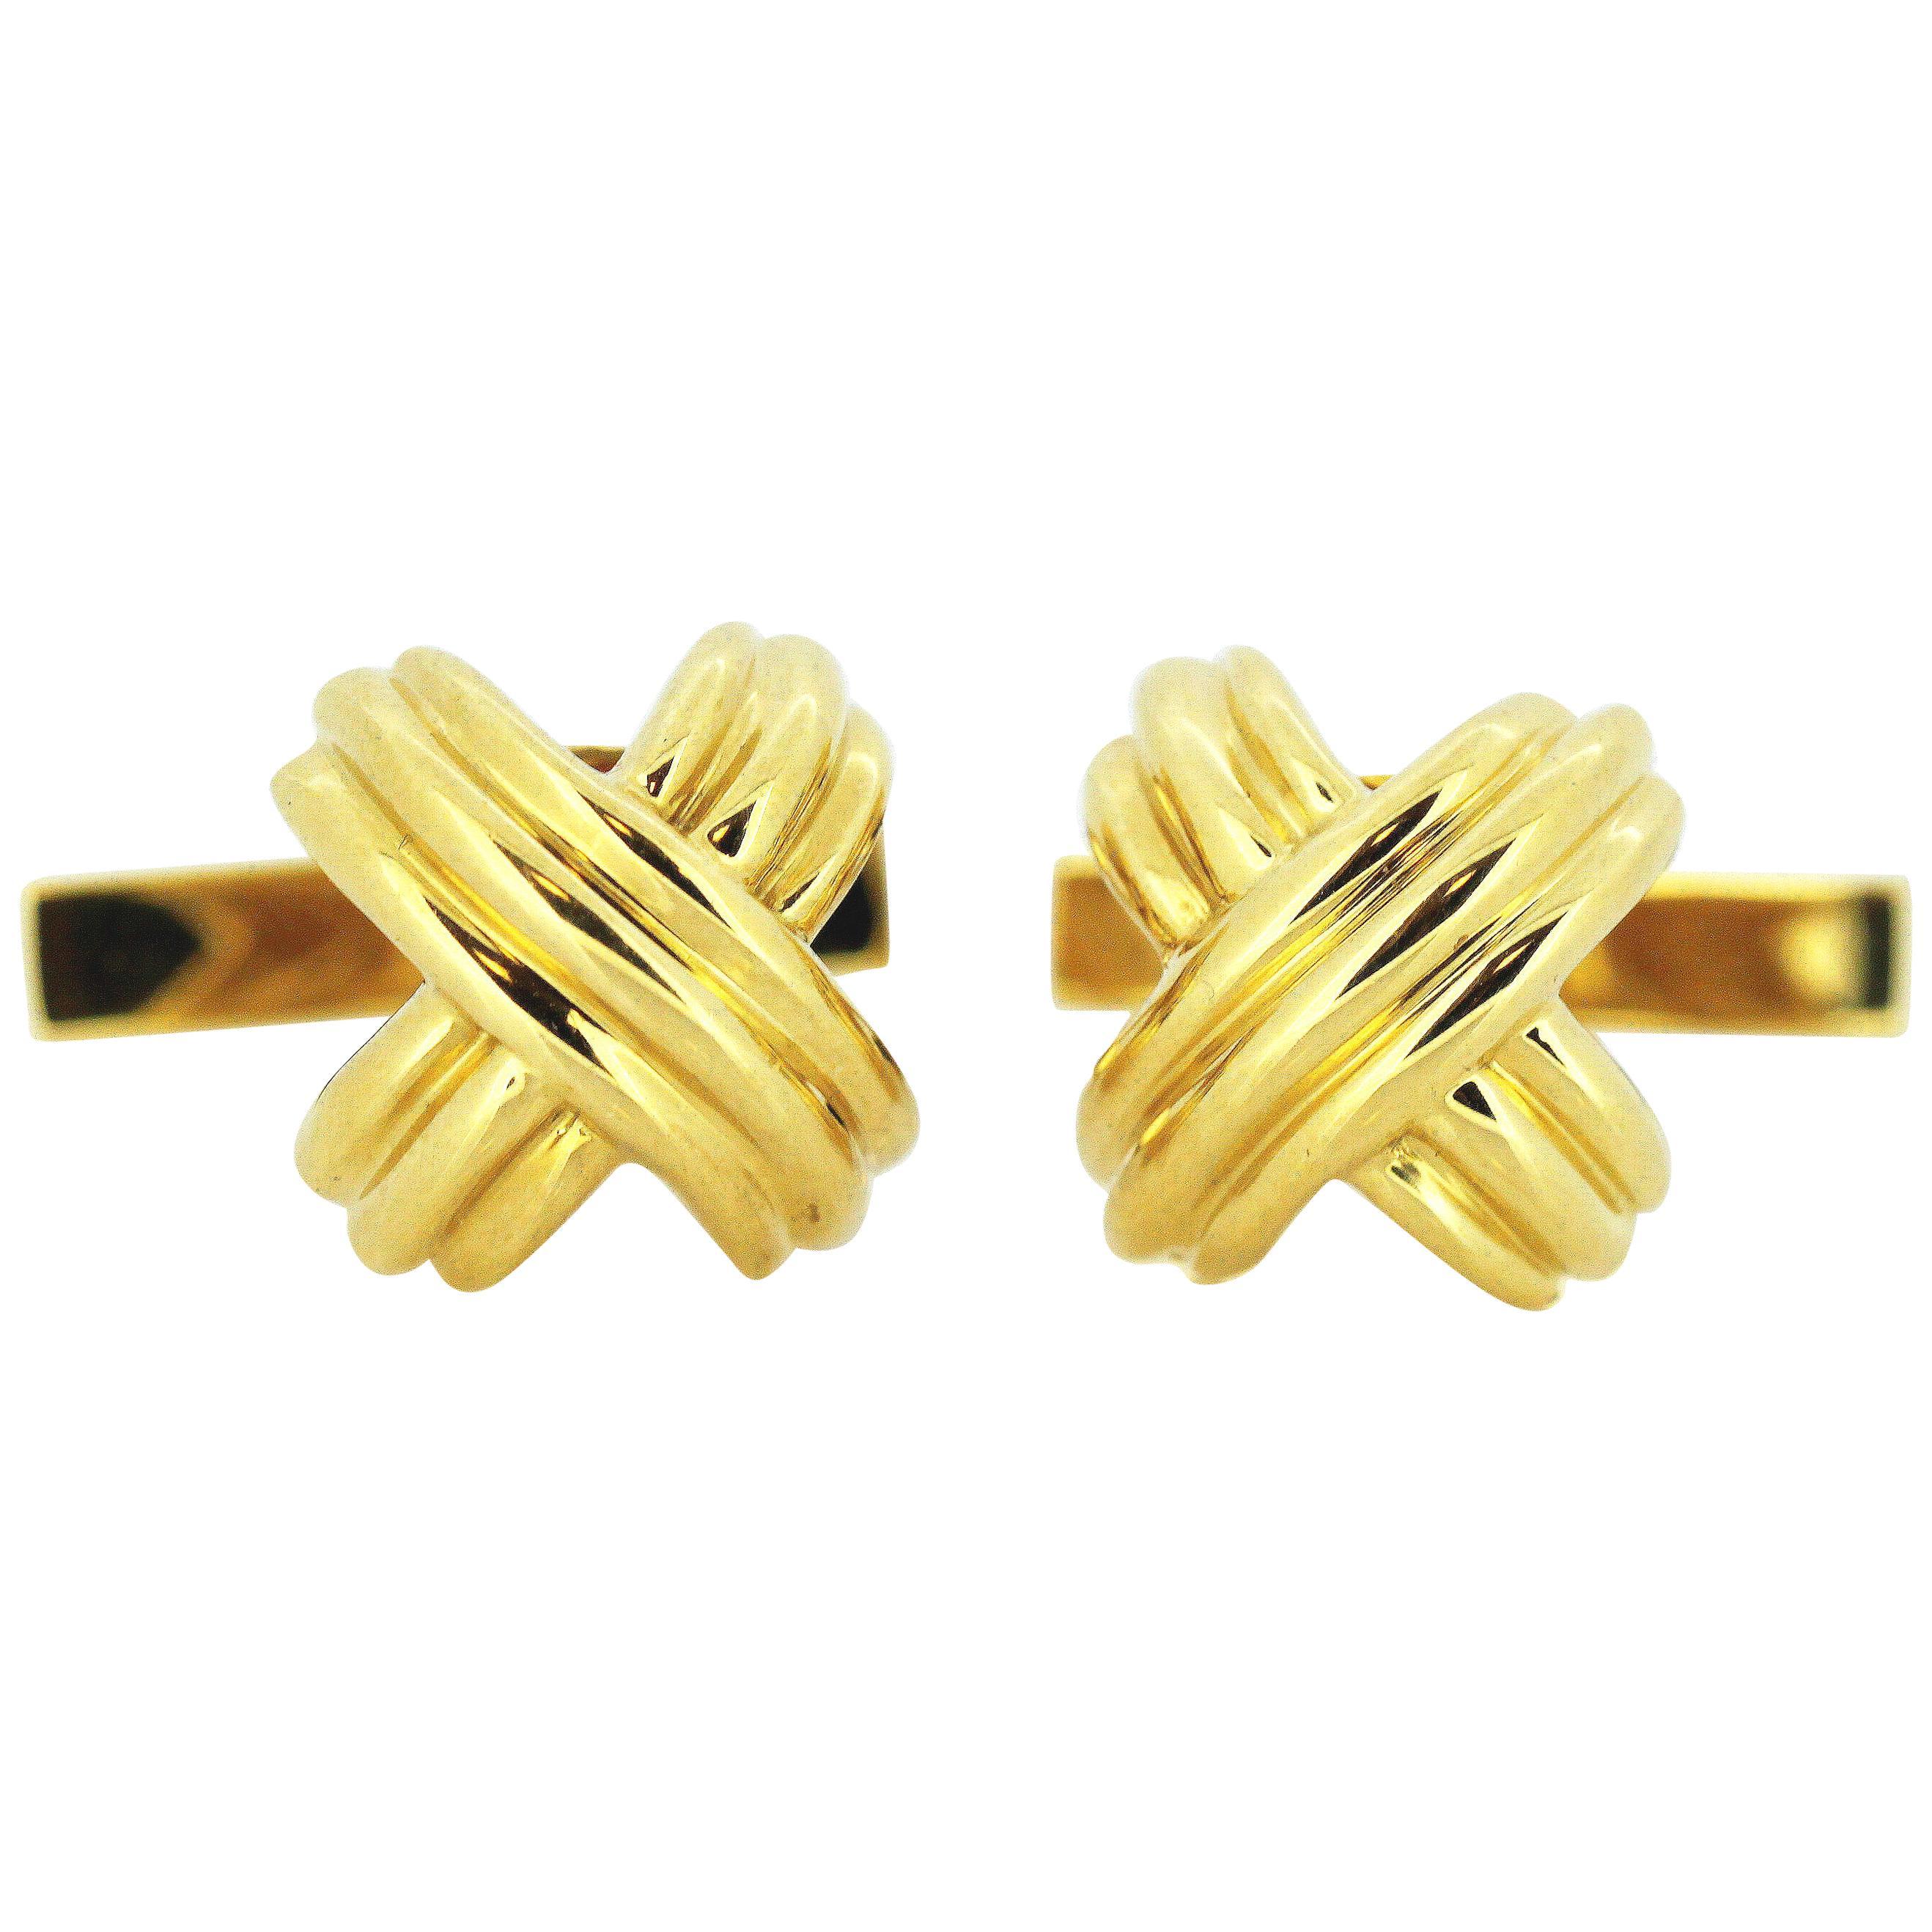 Tiffany & Co 18 Karat Yellow Gold Cufflinks, 1992